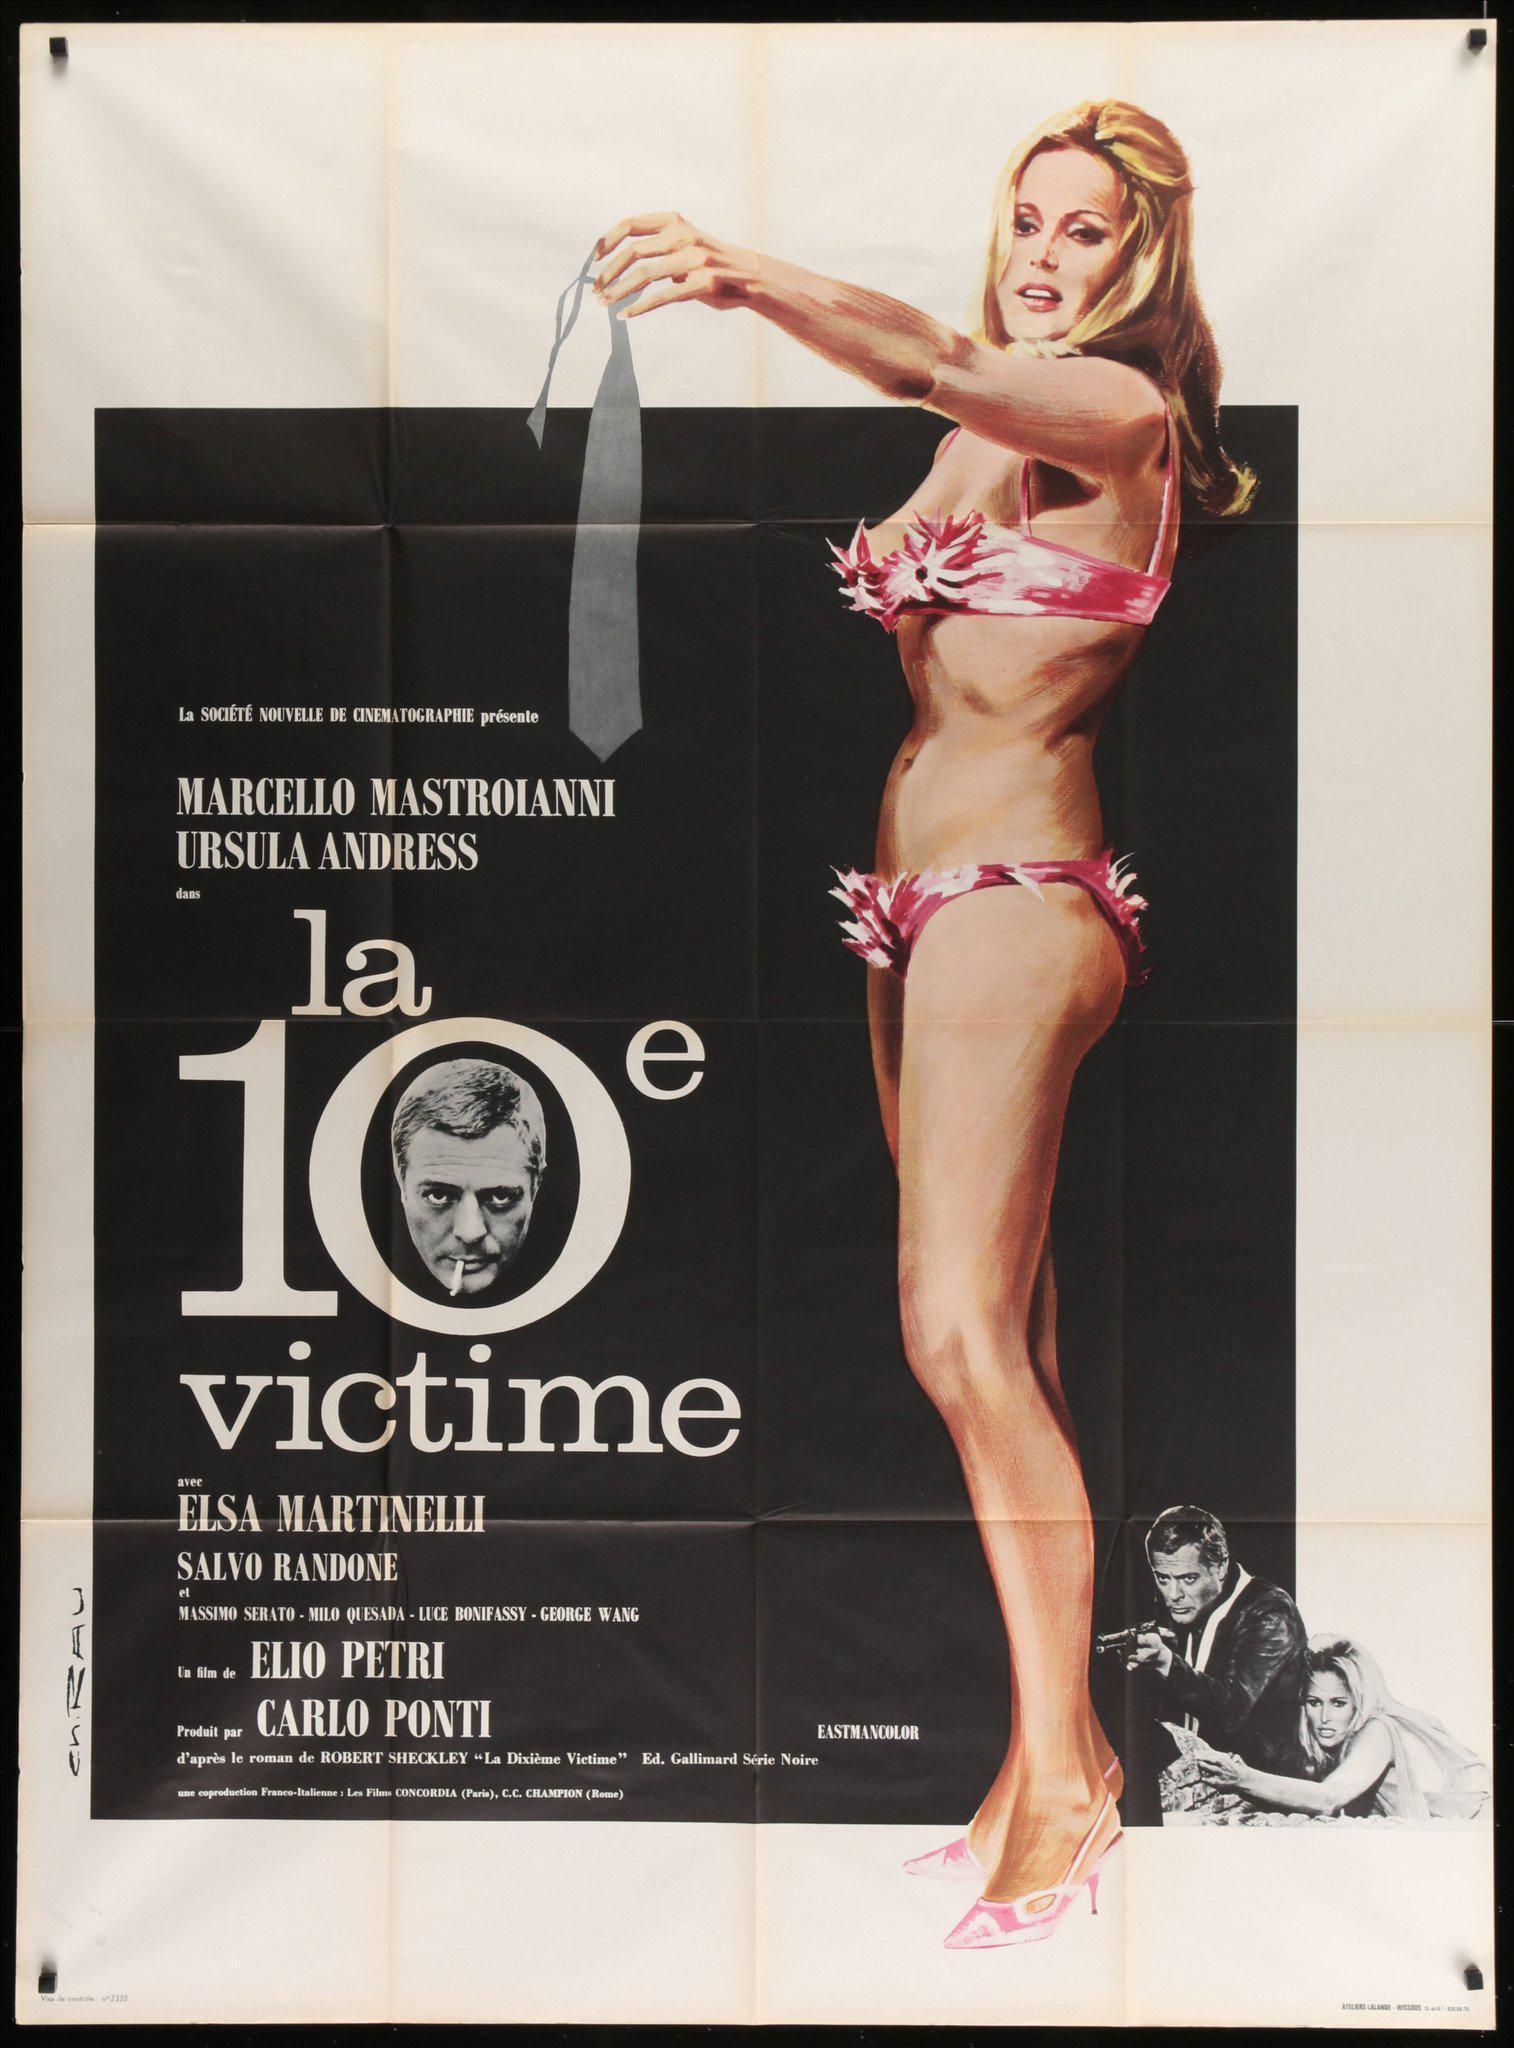 10th-victim-tenthla-decima-vittimala-10e-victime-vintage-movie-poster-original-french-1-panel-47x63-6443